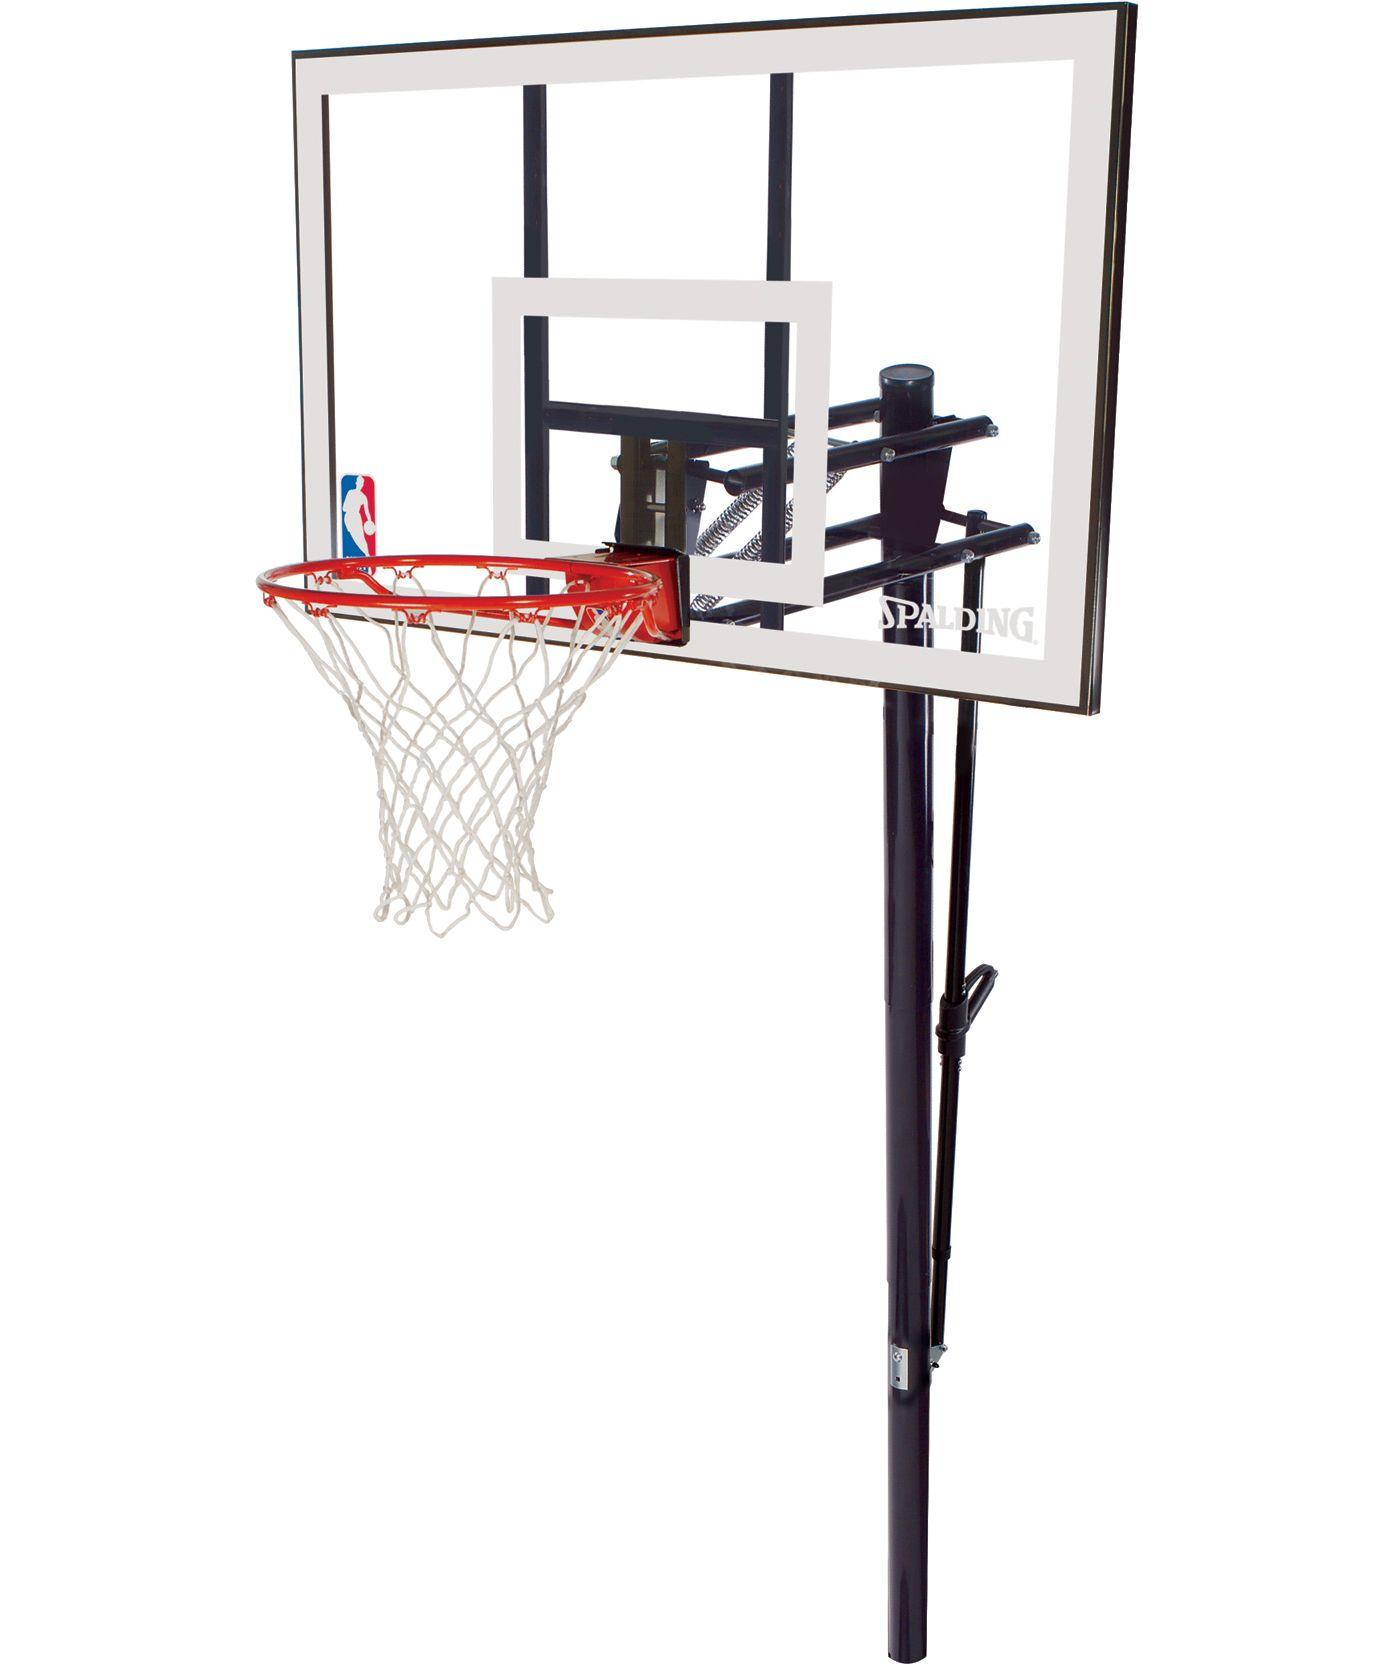 "Spalding 52"" Acrylic In-Ground Basketball Hoop"